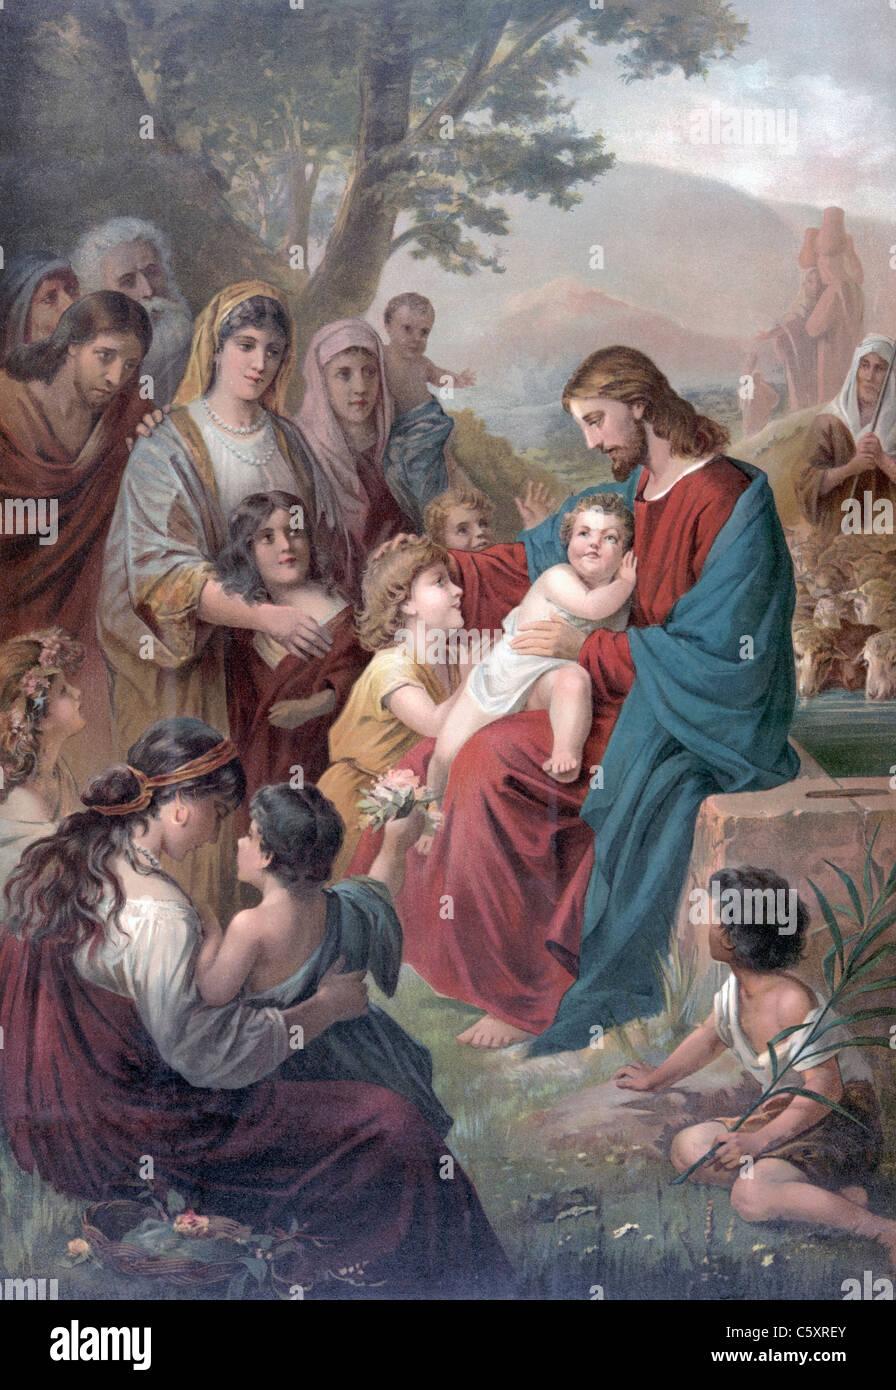 Suffer little children to come unto me - Jesus Christ with children illustration - Stock Image